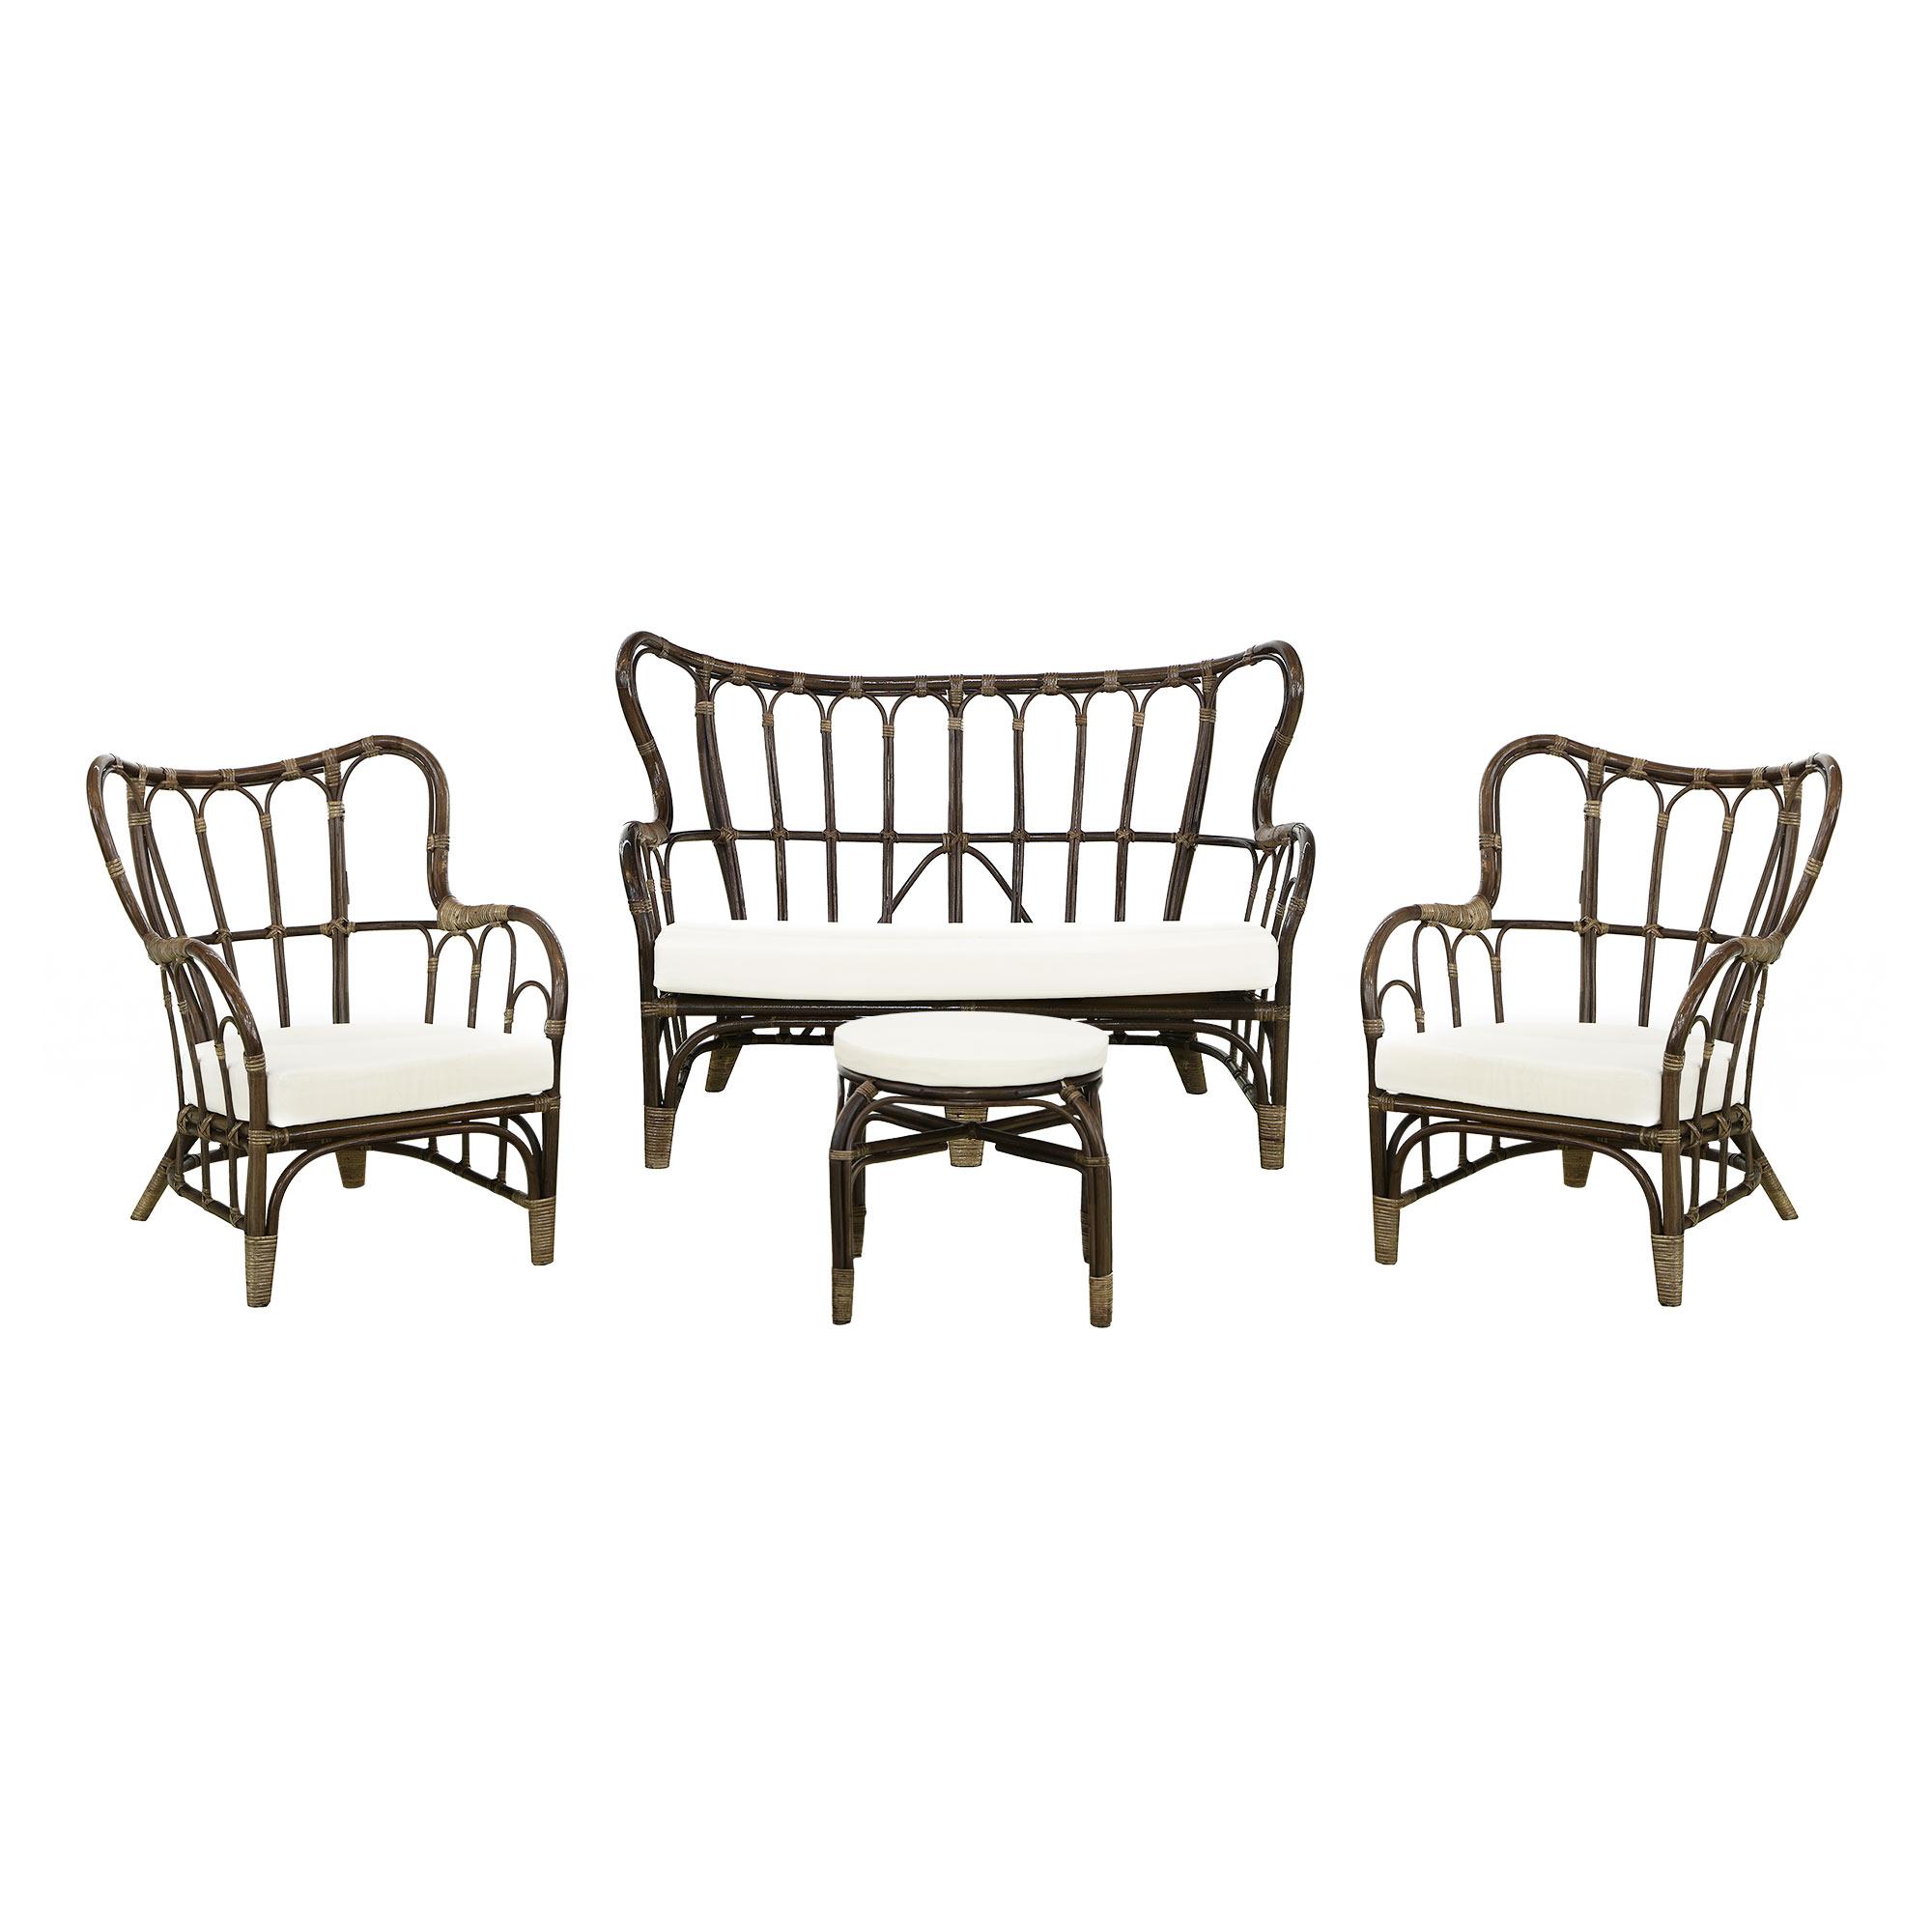 Фото - Комплект садовой мебели Rattan grand dark brown 4 предмета комплект садовой мебели бел мебельторг набор мебели сан ремо мини